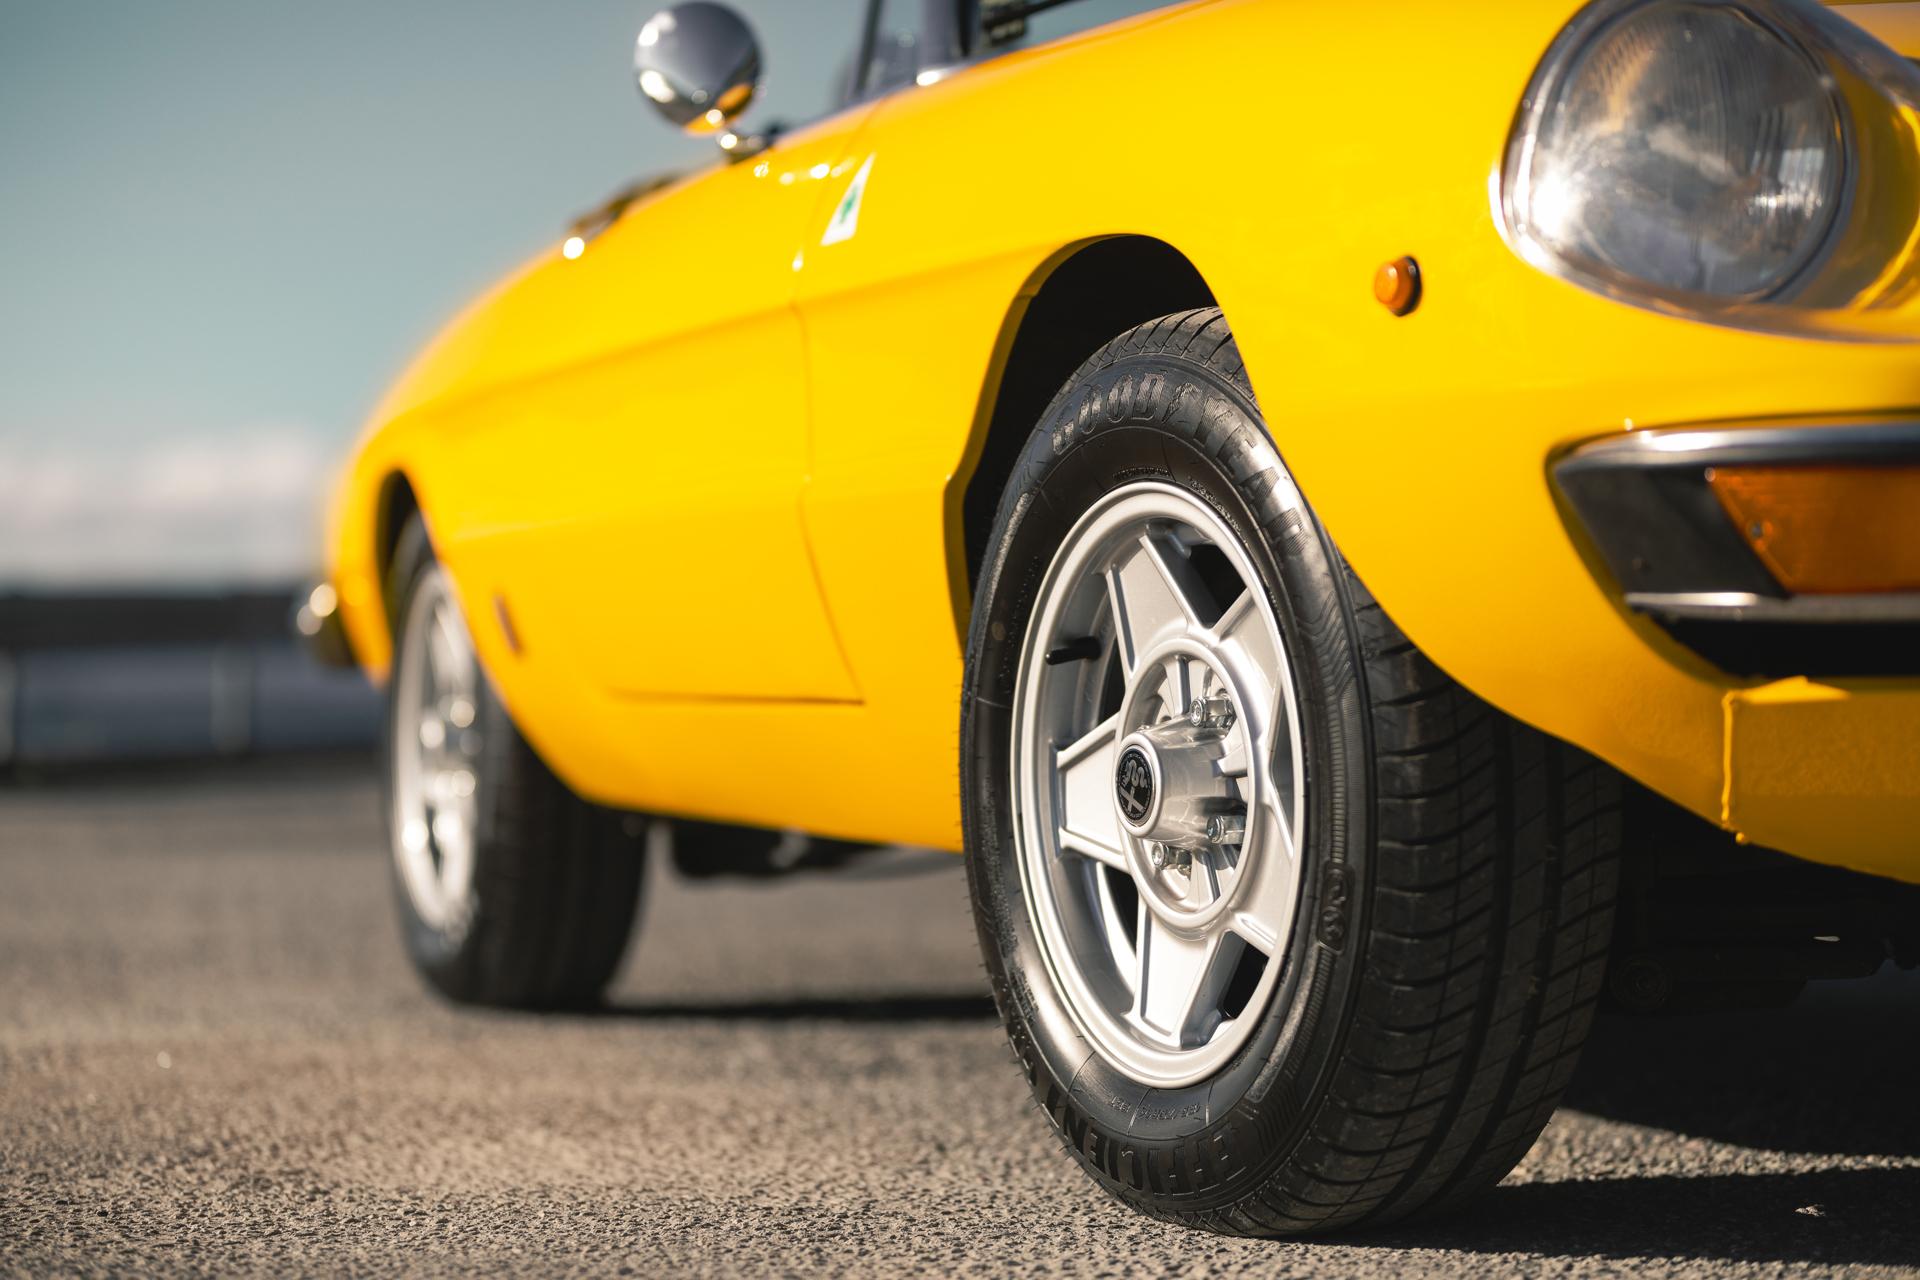 Alfa_Romeo_Spider_19.06.18-6.jpg